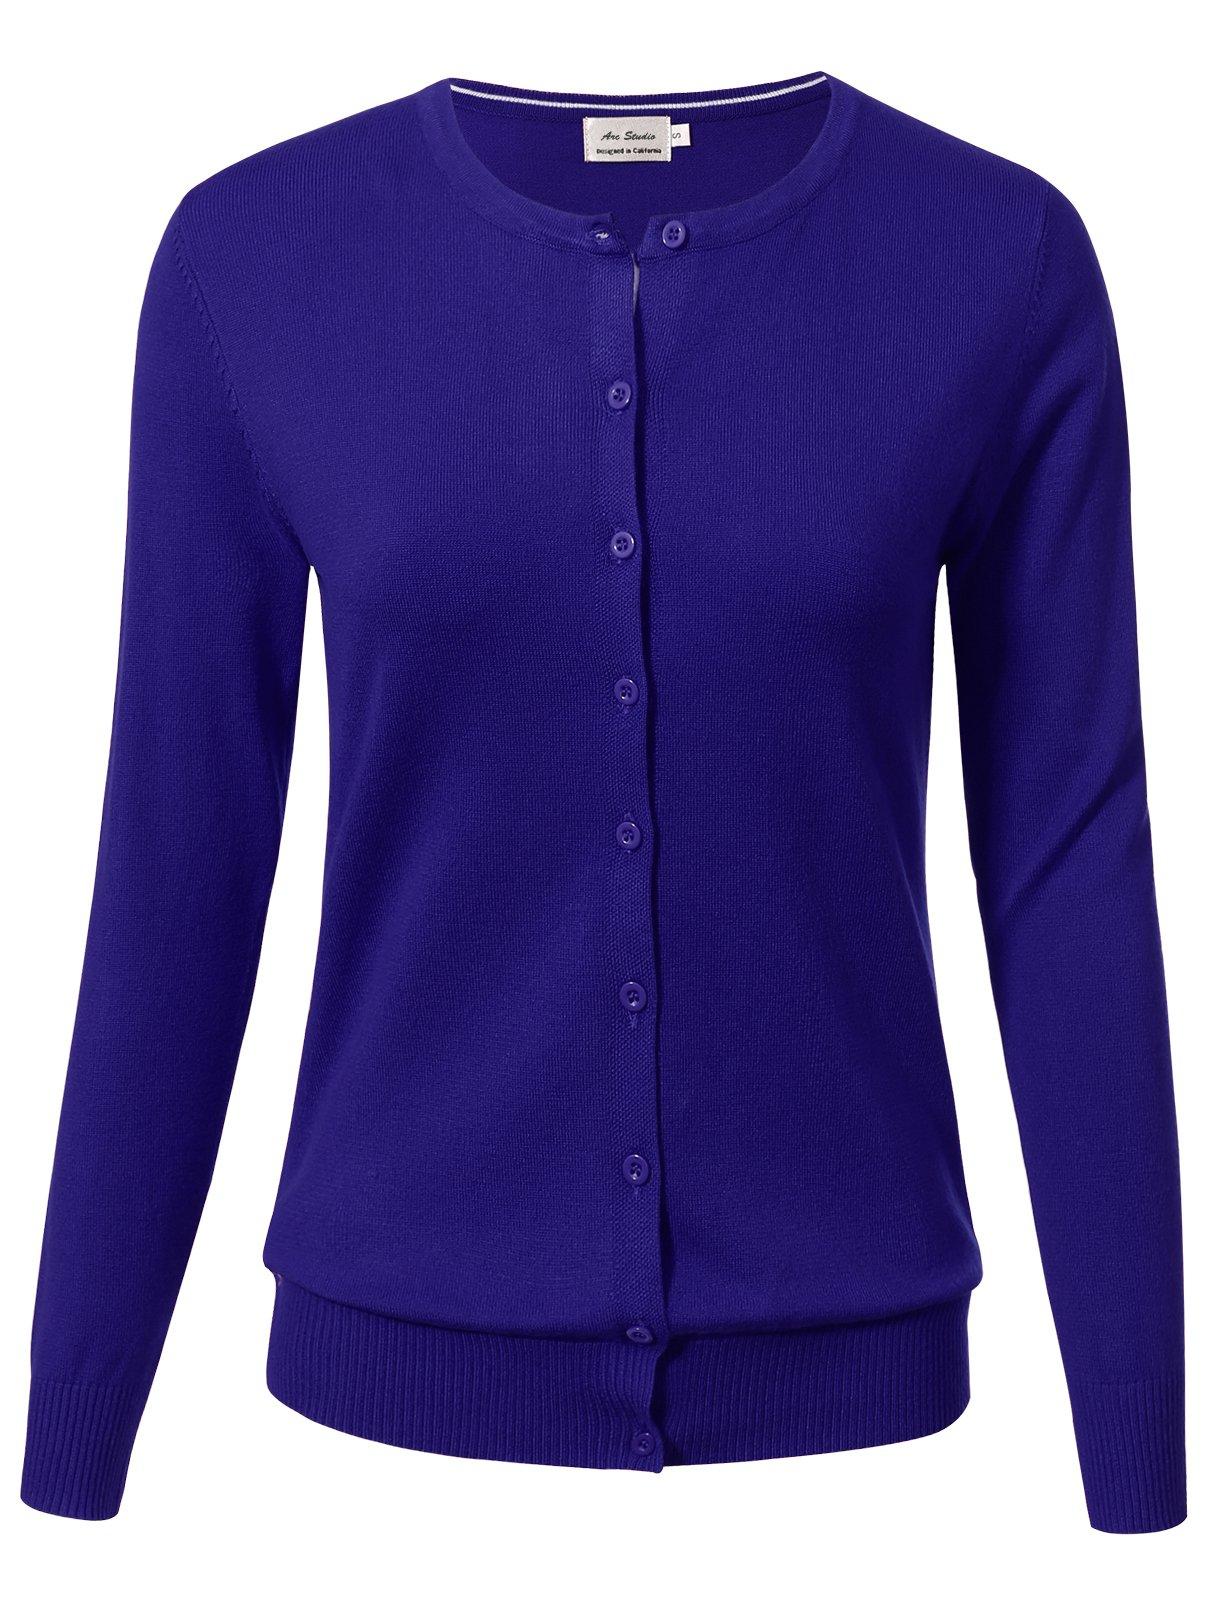 Women Button Down Long Sleeve Crewneck Soft Knit Cardigan Sweater S Royalblue